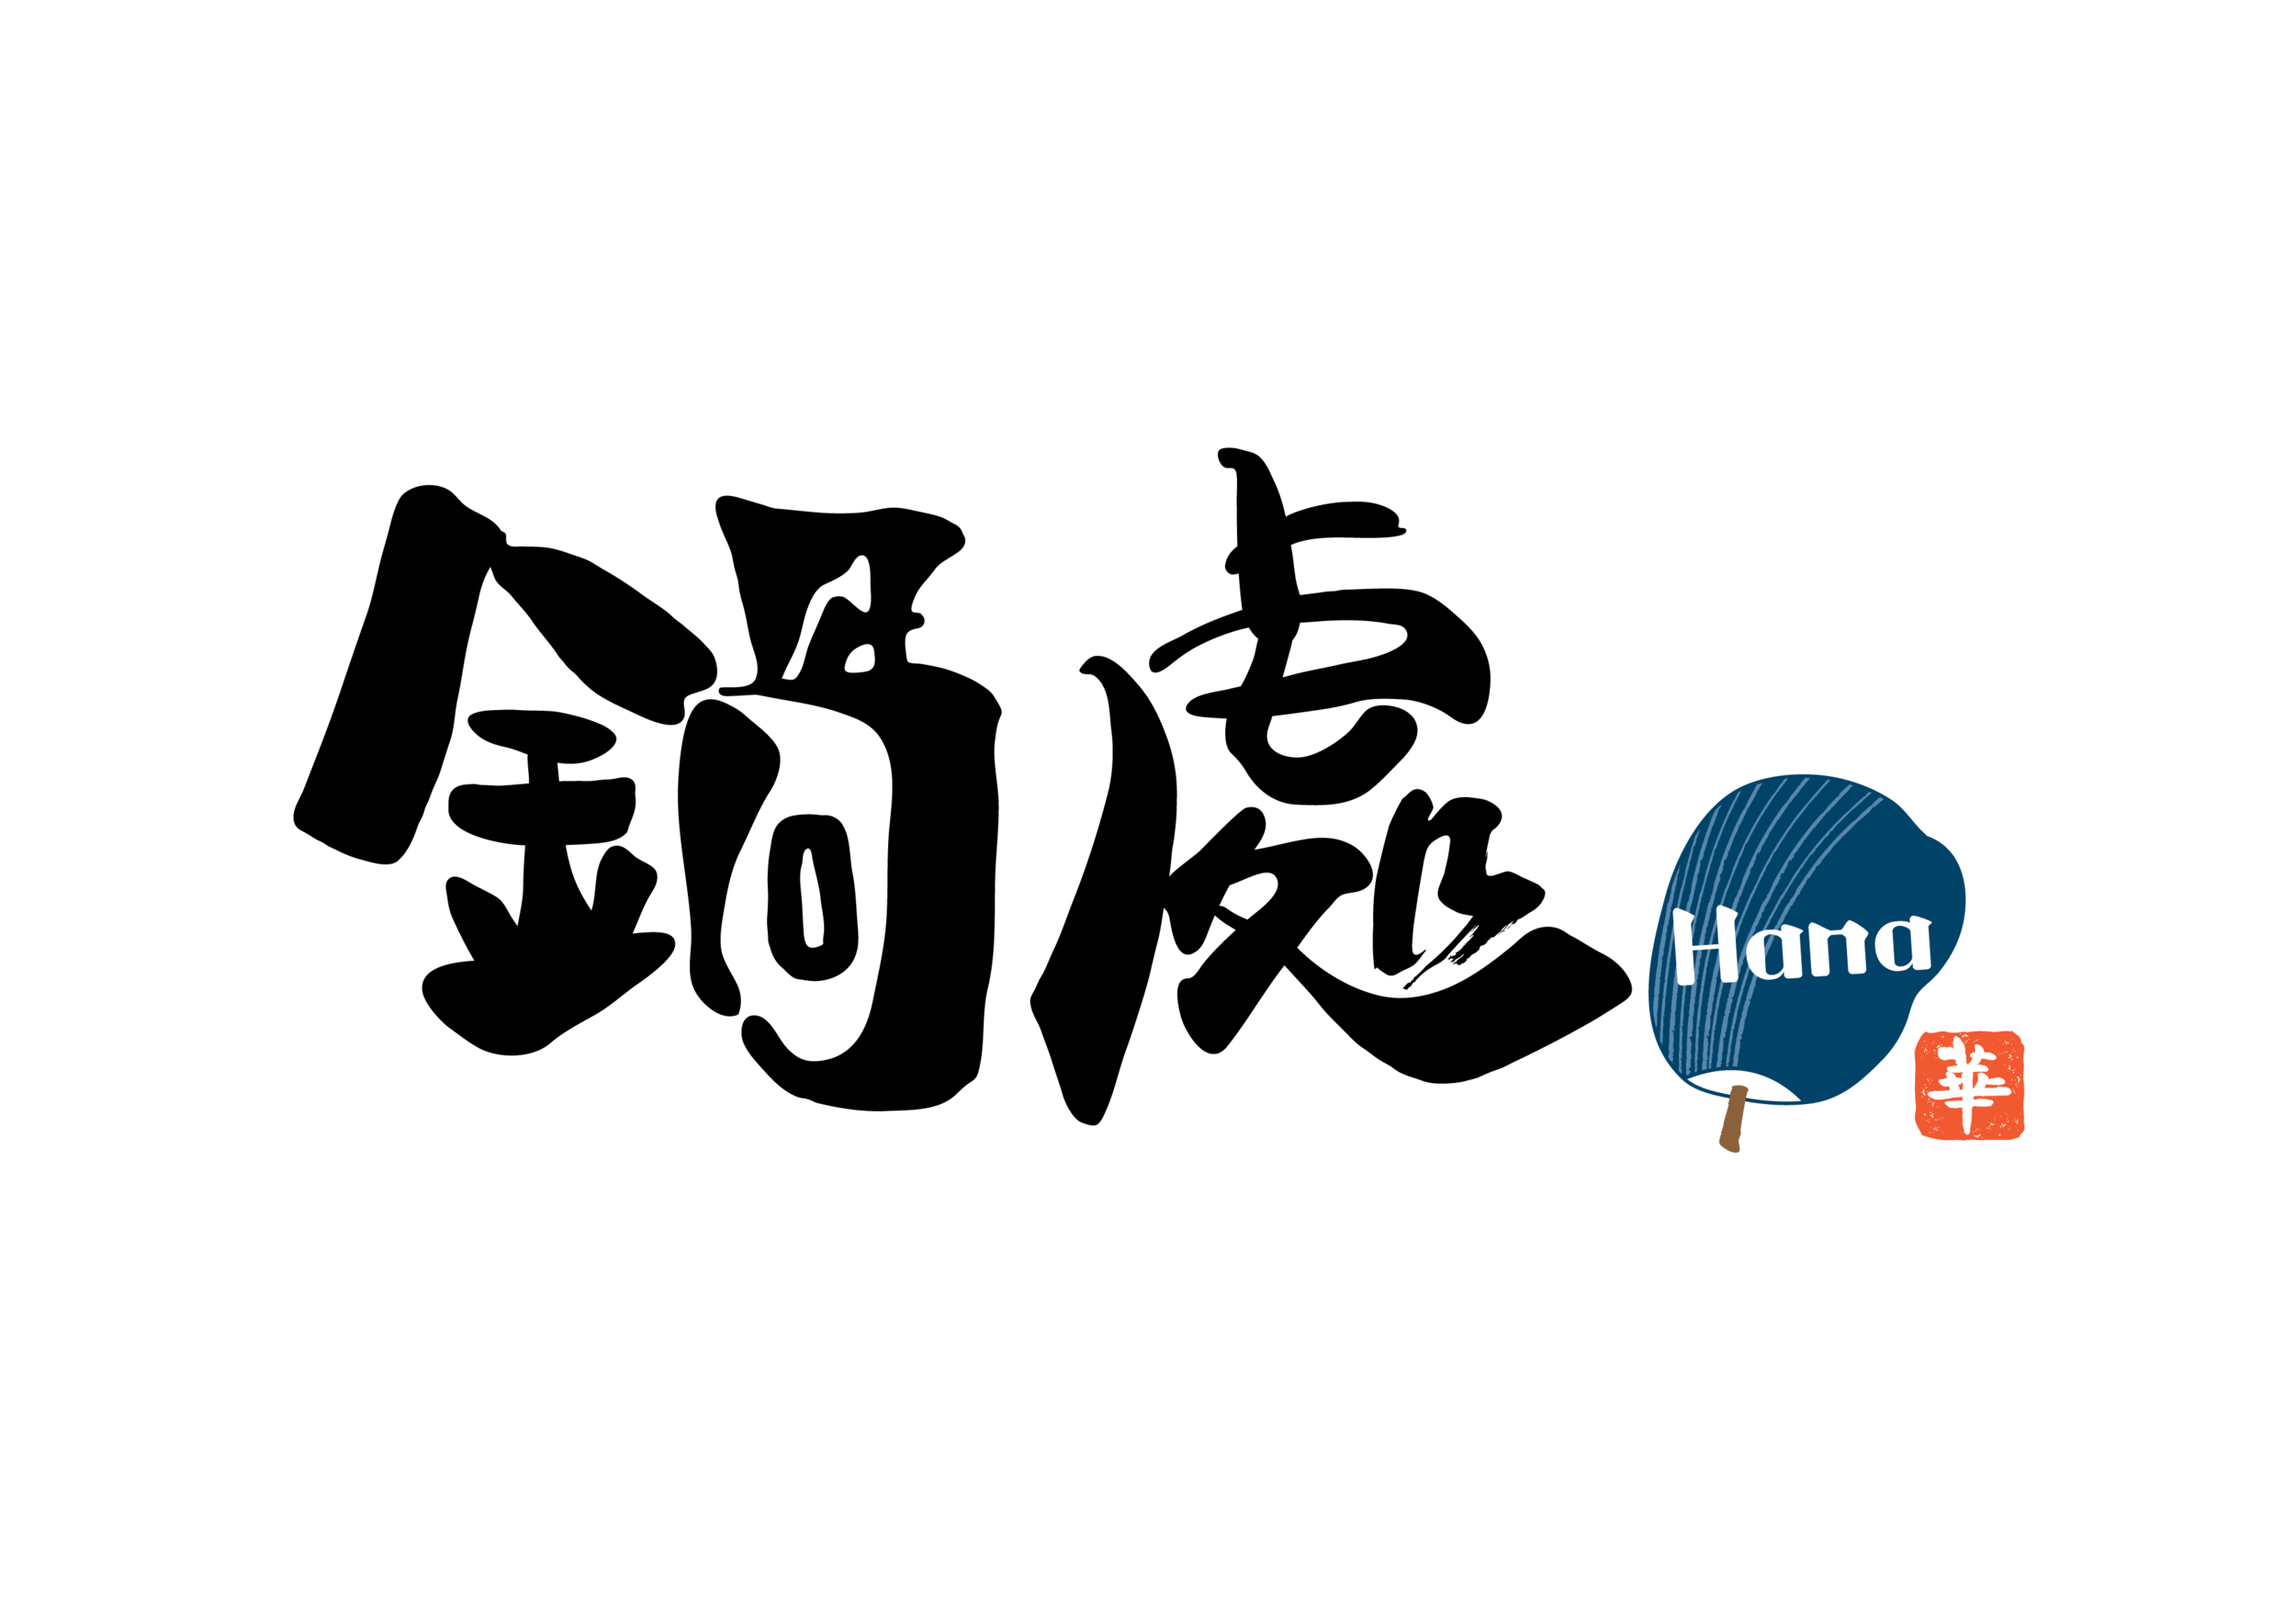 HanaTC-logo-01.png